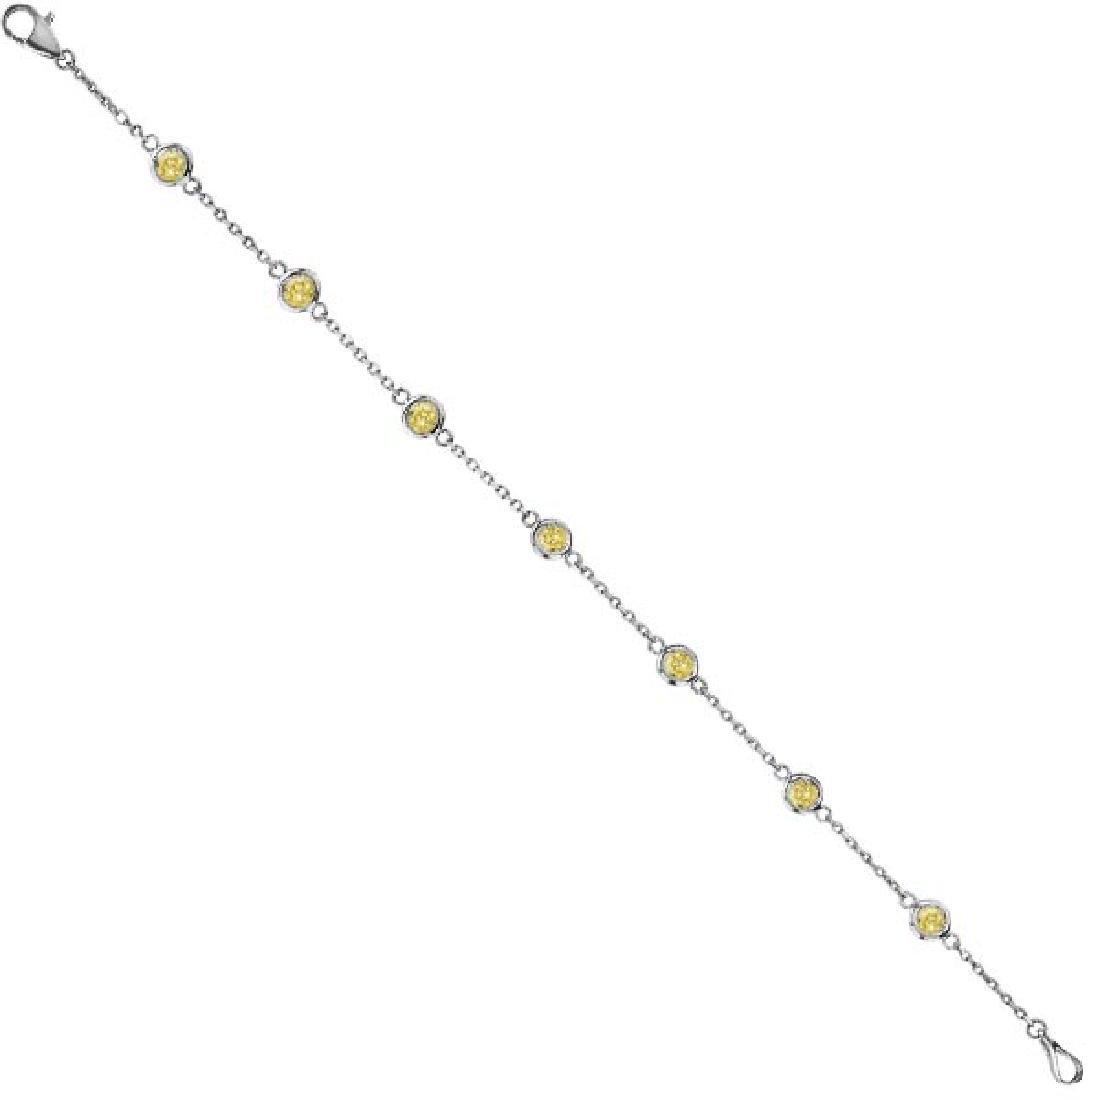 Yellow Diamonds by The Yard Bezel-Set Bracelet 14K Whit